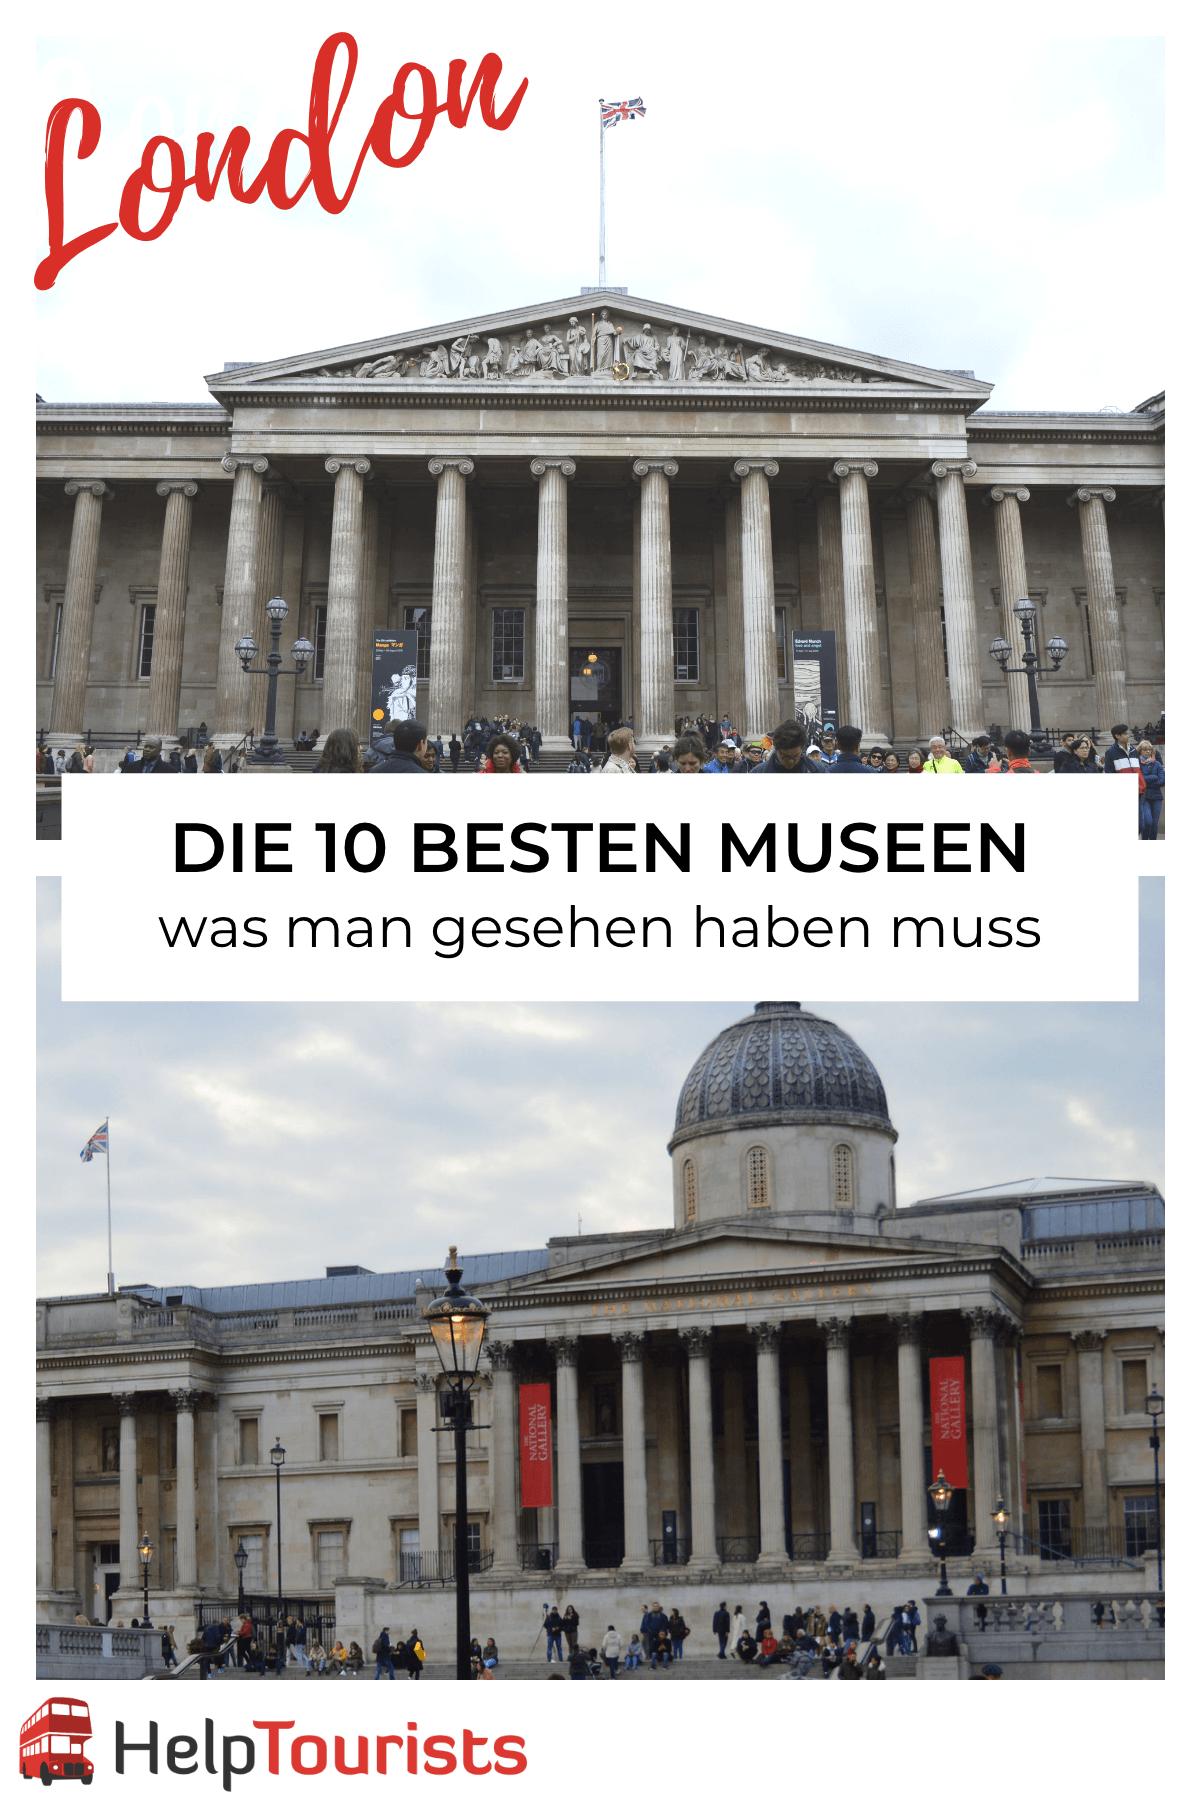 Die 10 besten Museen in London